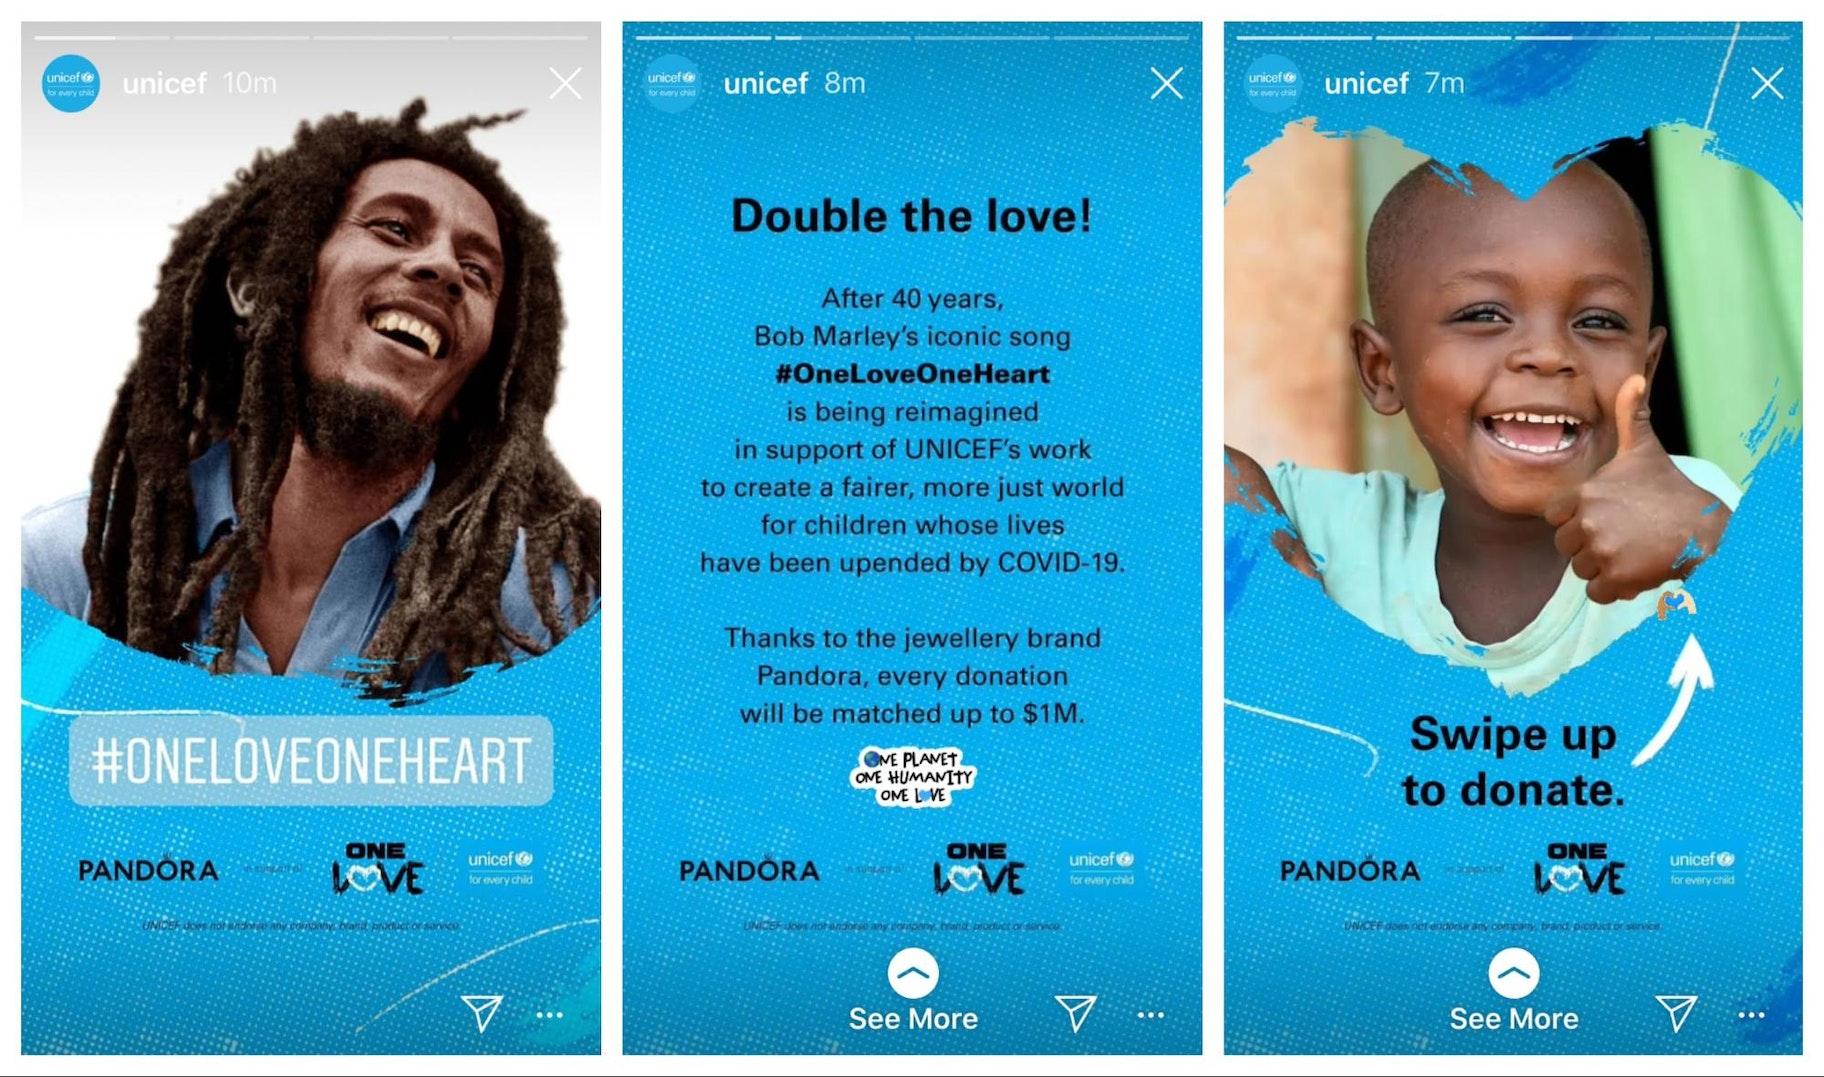 Unicef Instagram Story Design Example